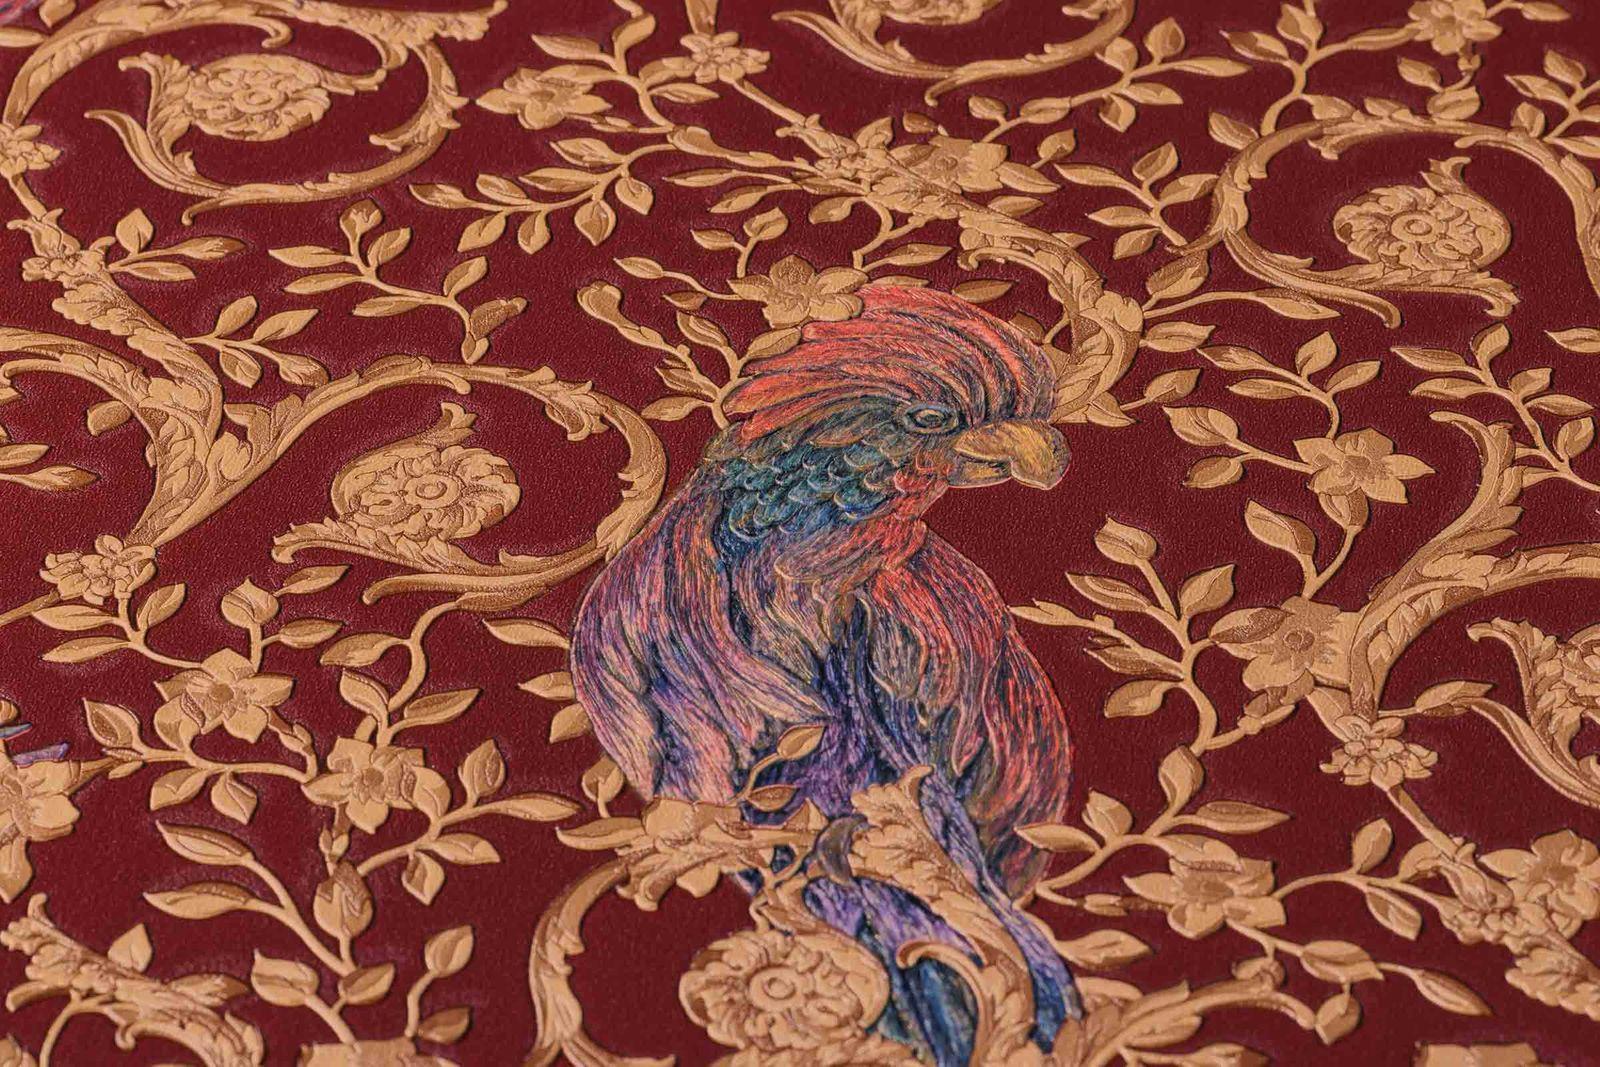 Wallpaper Versace Home Ornament Birds Red Gold Metallic 370534